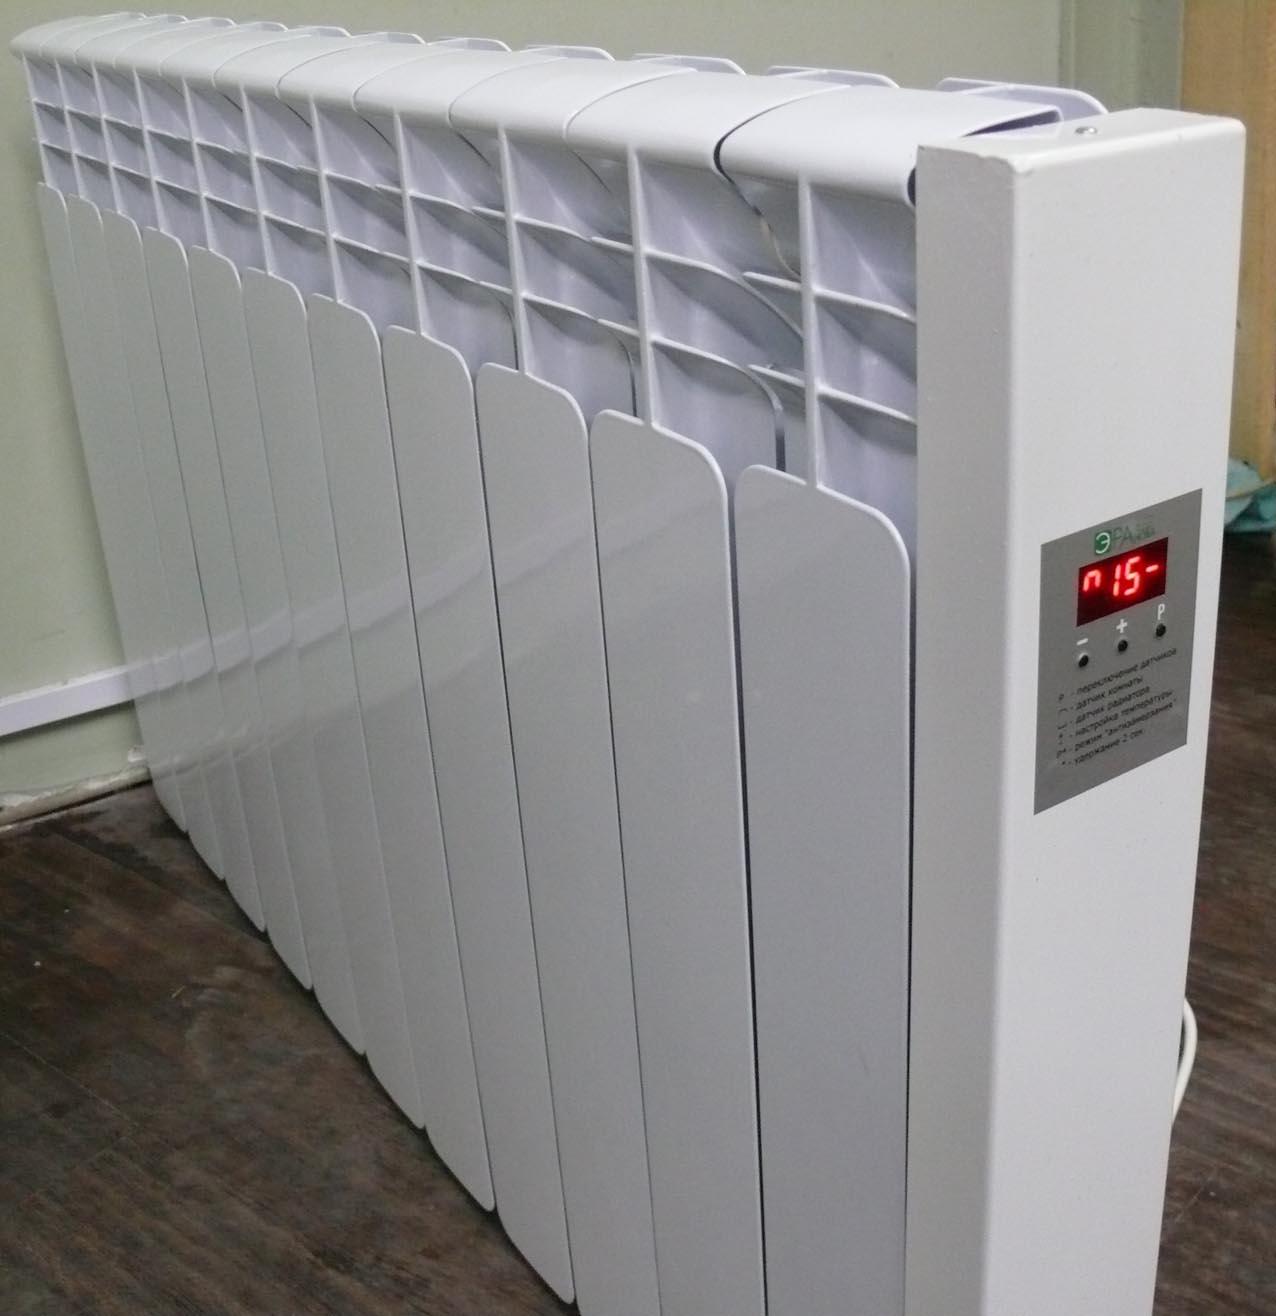 терморегулятор своими руками схема для электрокотла